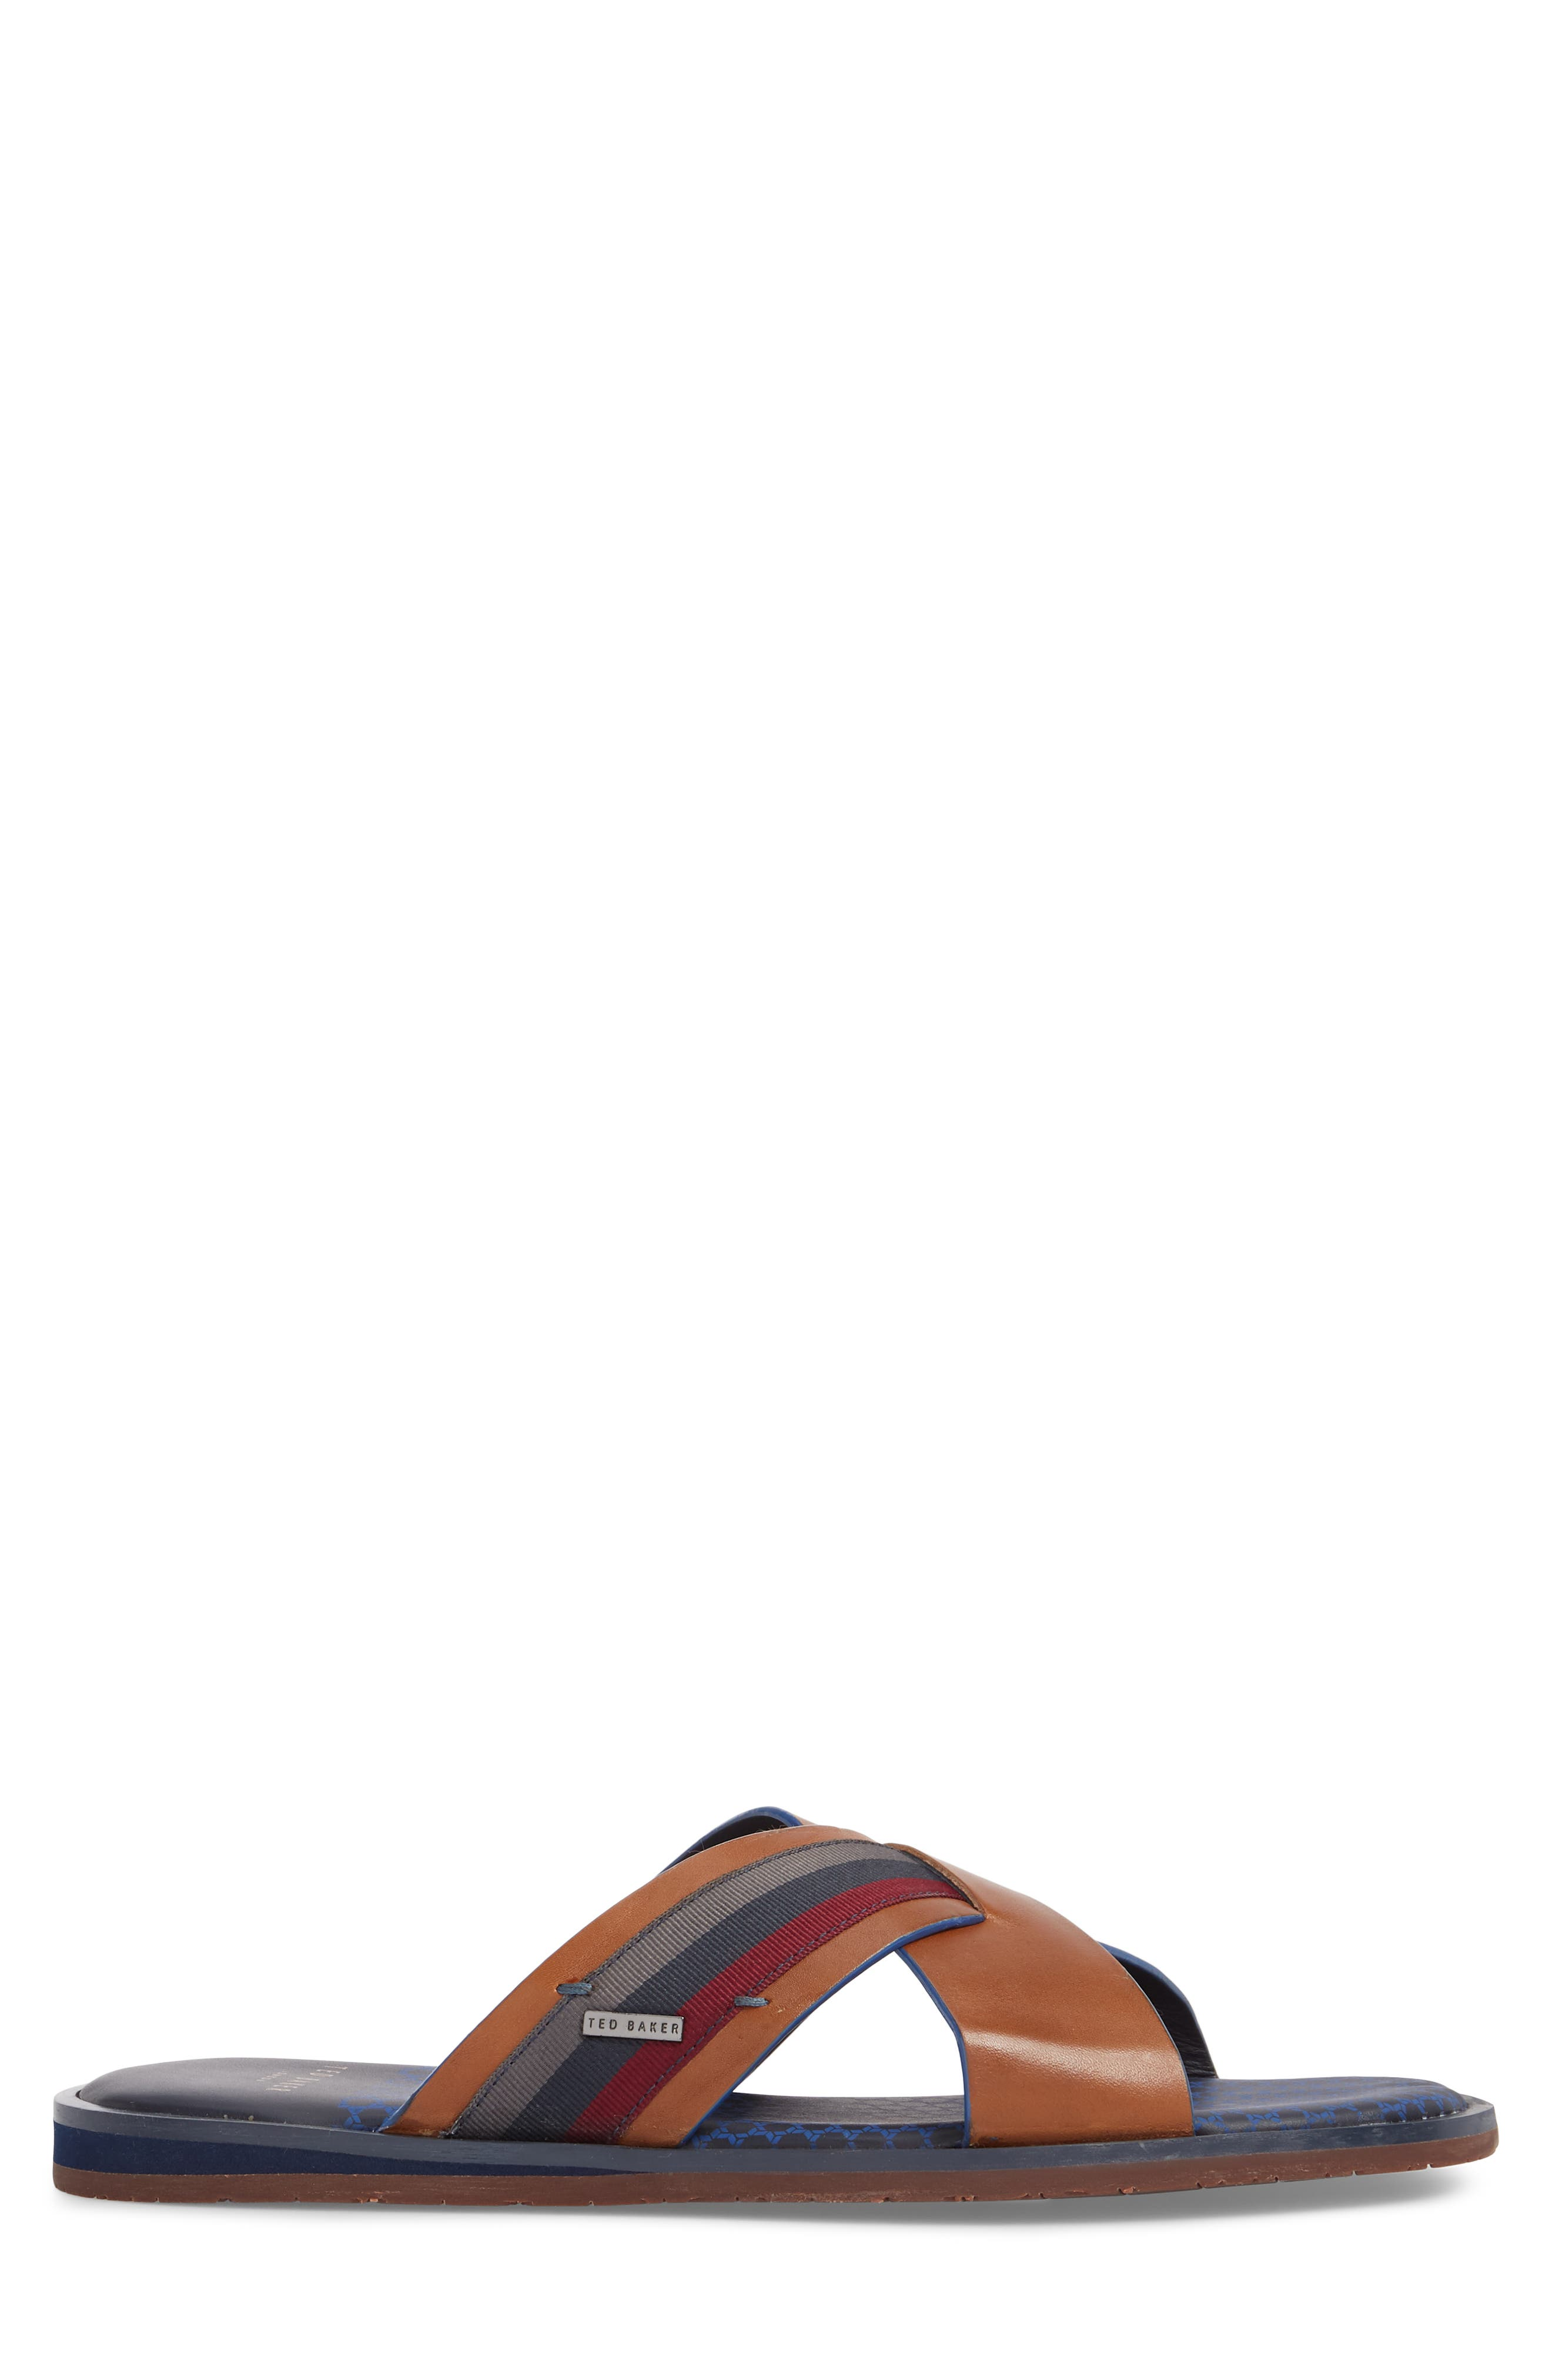 Farrull Cross Strap Slide Sandal,                             Alternate thumbnail 3, color,                             Tan Leather/ Textile